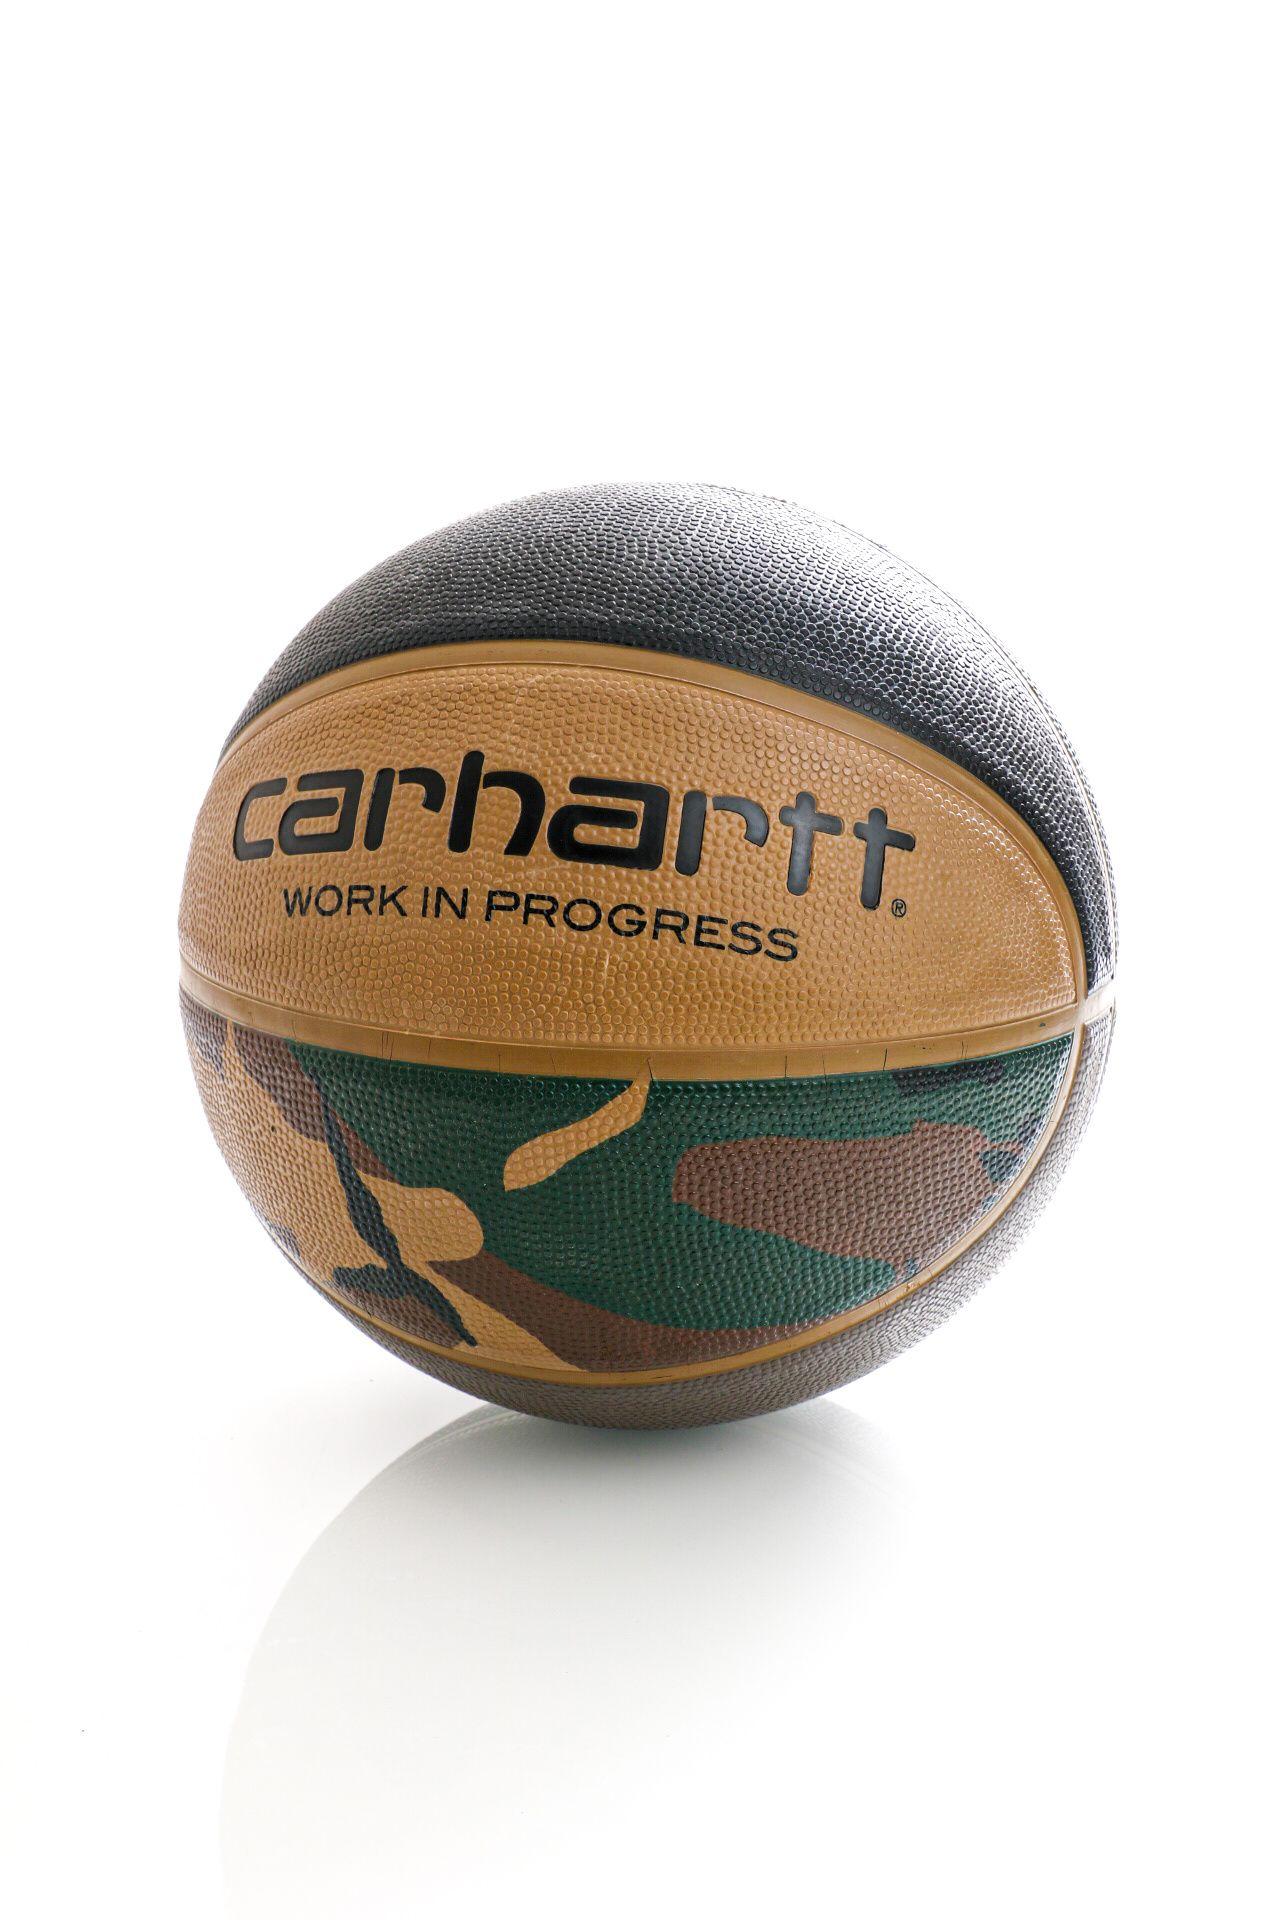 Afbeelding van Carhartt Valiant 4 Basketball Camo Laurel, Black, Air Force Grey, Leather I021385